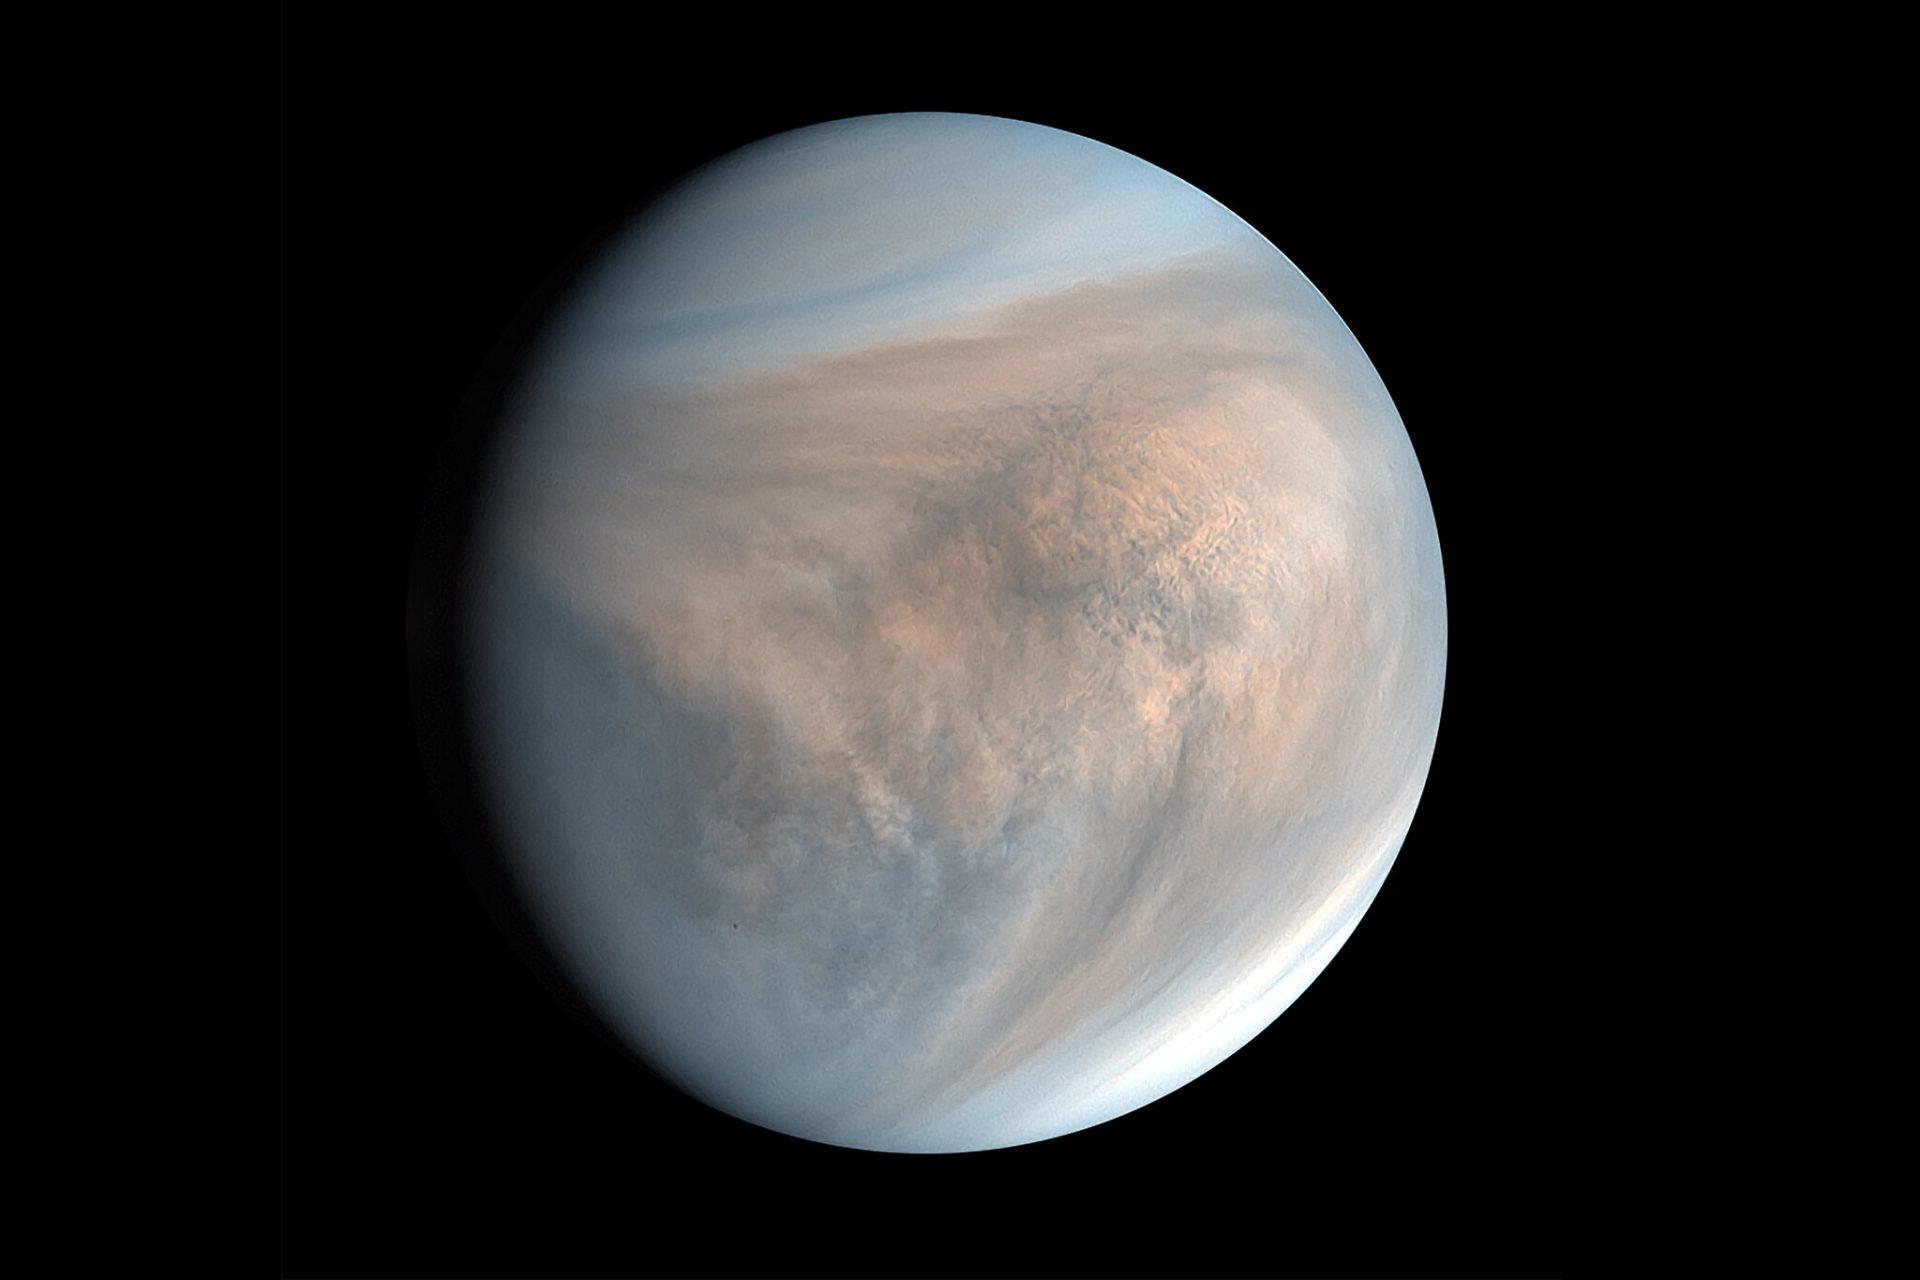 Each Day On Venus Lasts 243 Earth Days